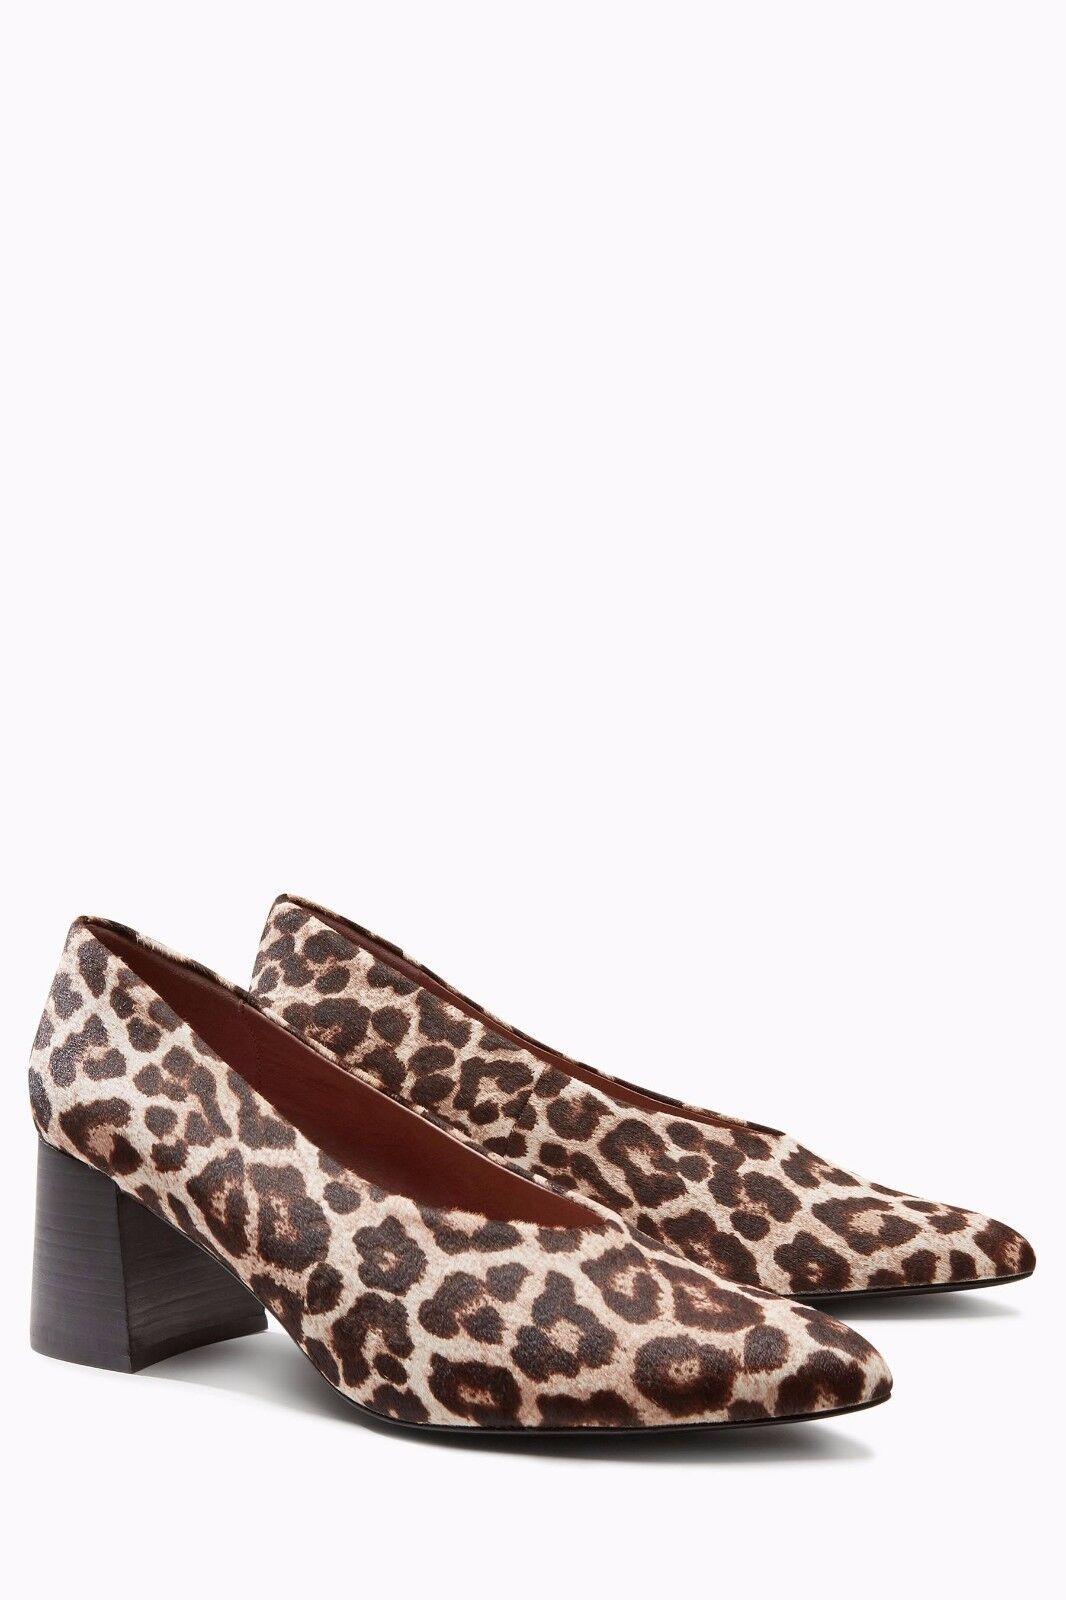 Next Heel Leather Leopard Print Block Heel Next Court Shoes 9/43 2c38da